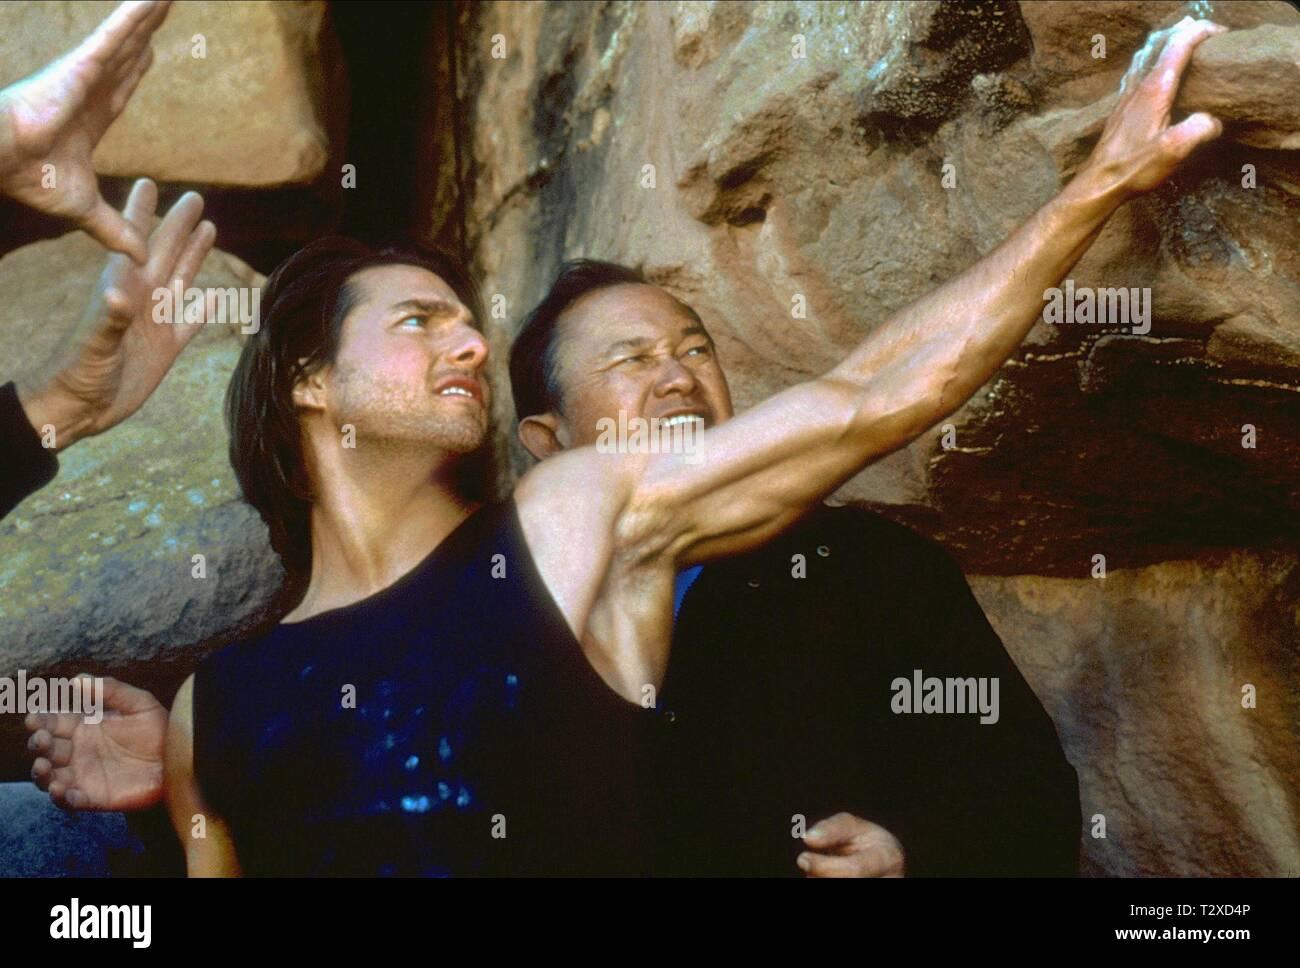 Tom Cruise John Woo Mission Impossible Ii 2000 Stock Photo Alamy